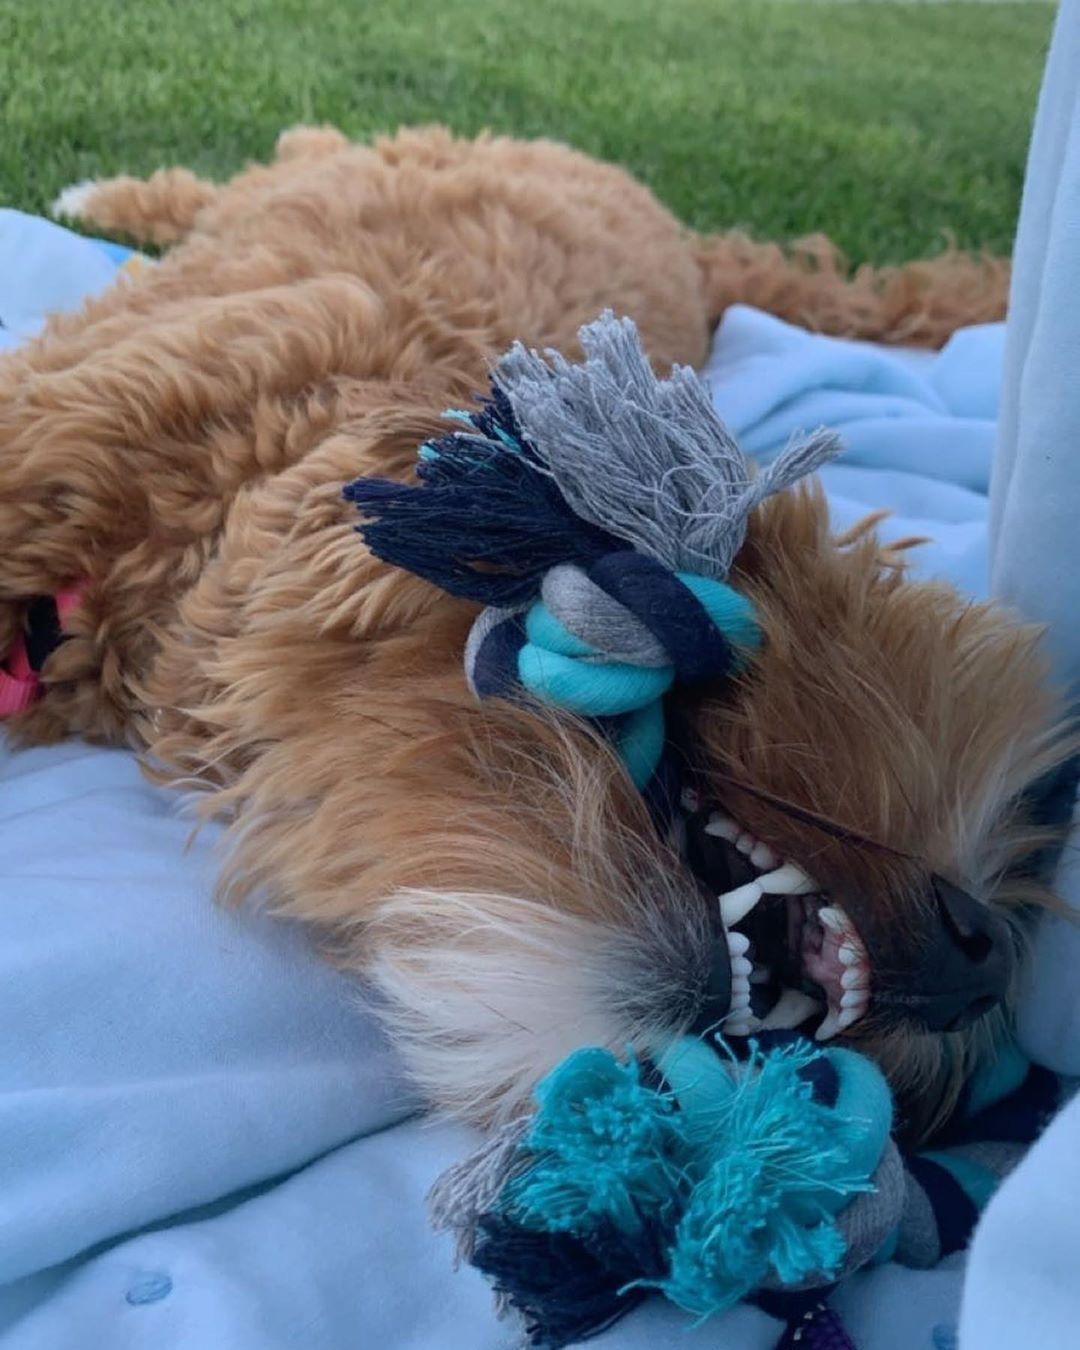 Loving on my new rope at the baseball game⚾️ #jerseykauf #toys #rope #playingpup #montanaskylabradoodles #australianlabradoodle #ilovemydog #puppy #jerseyrose